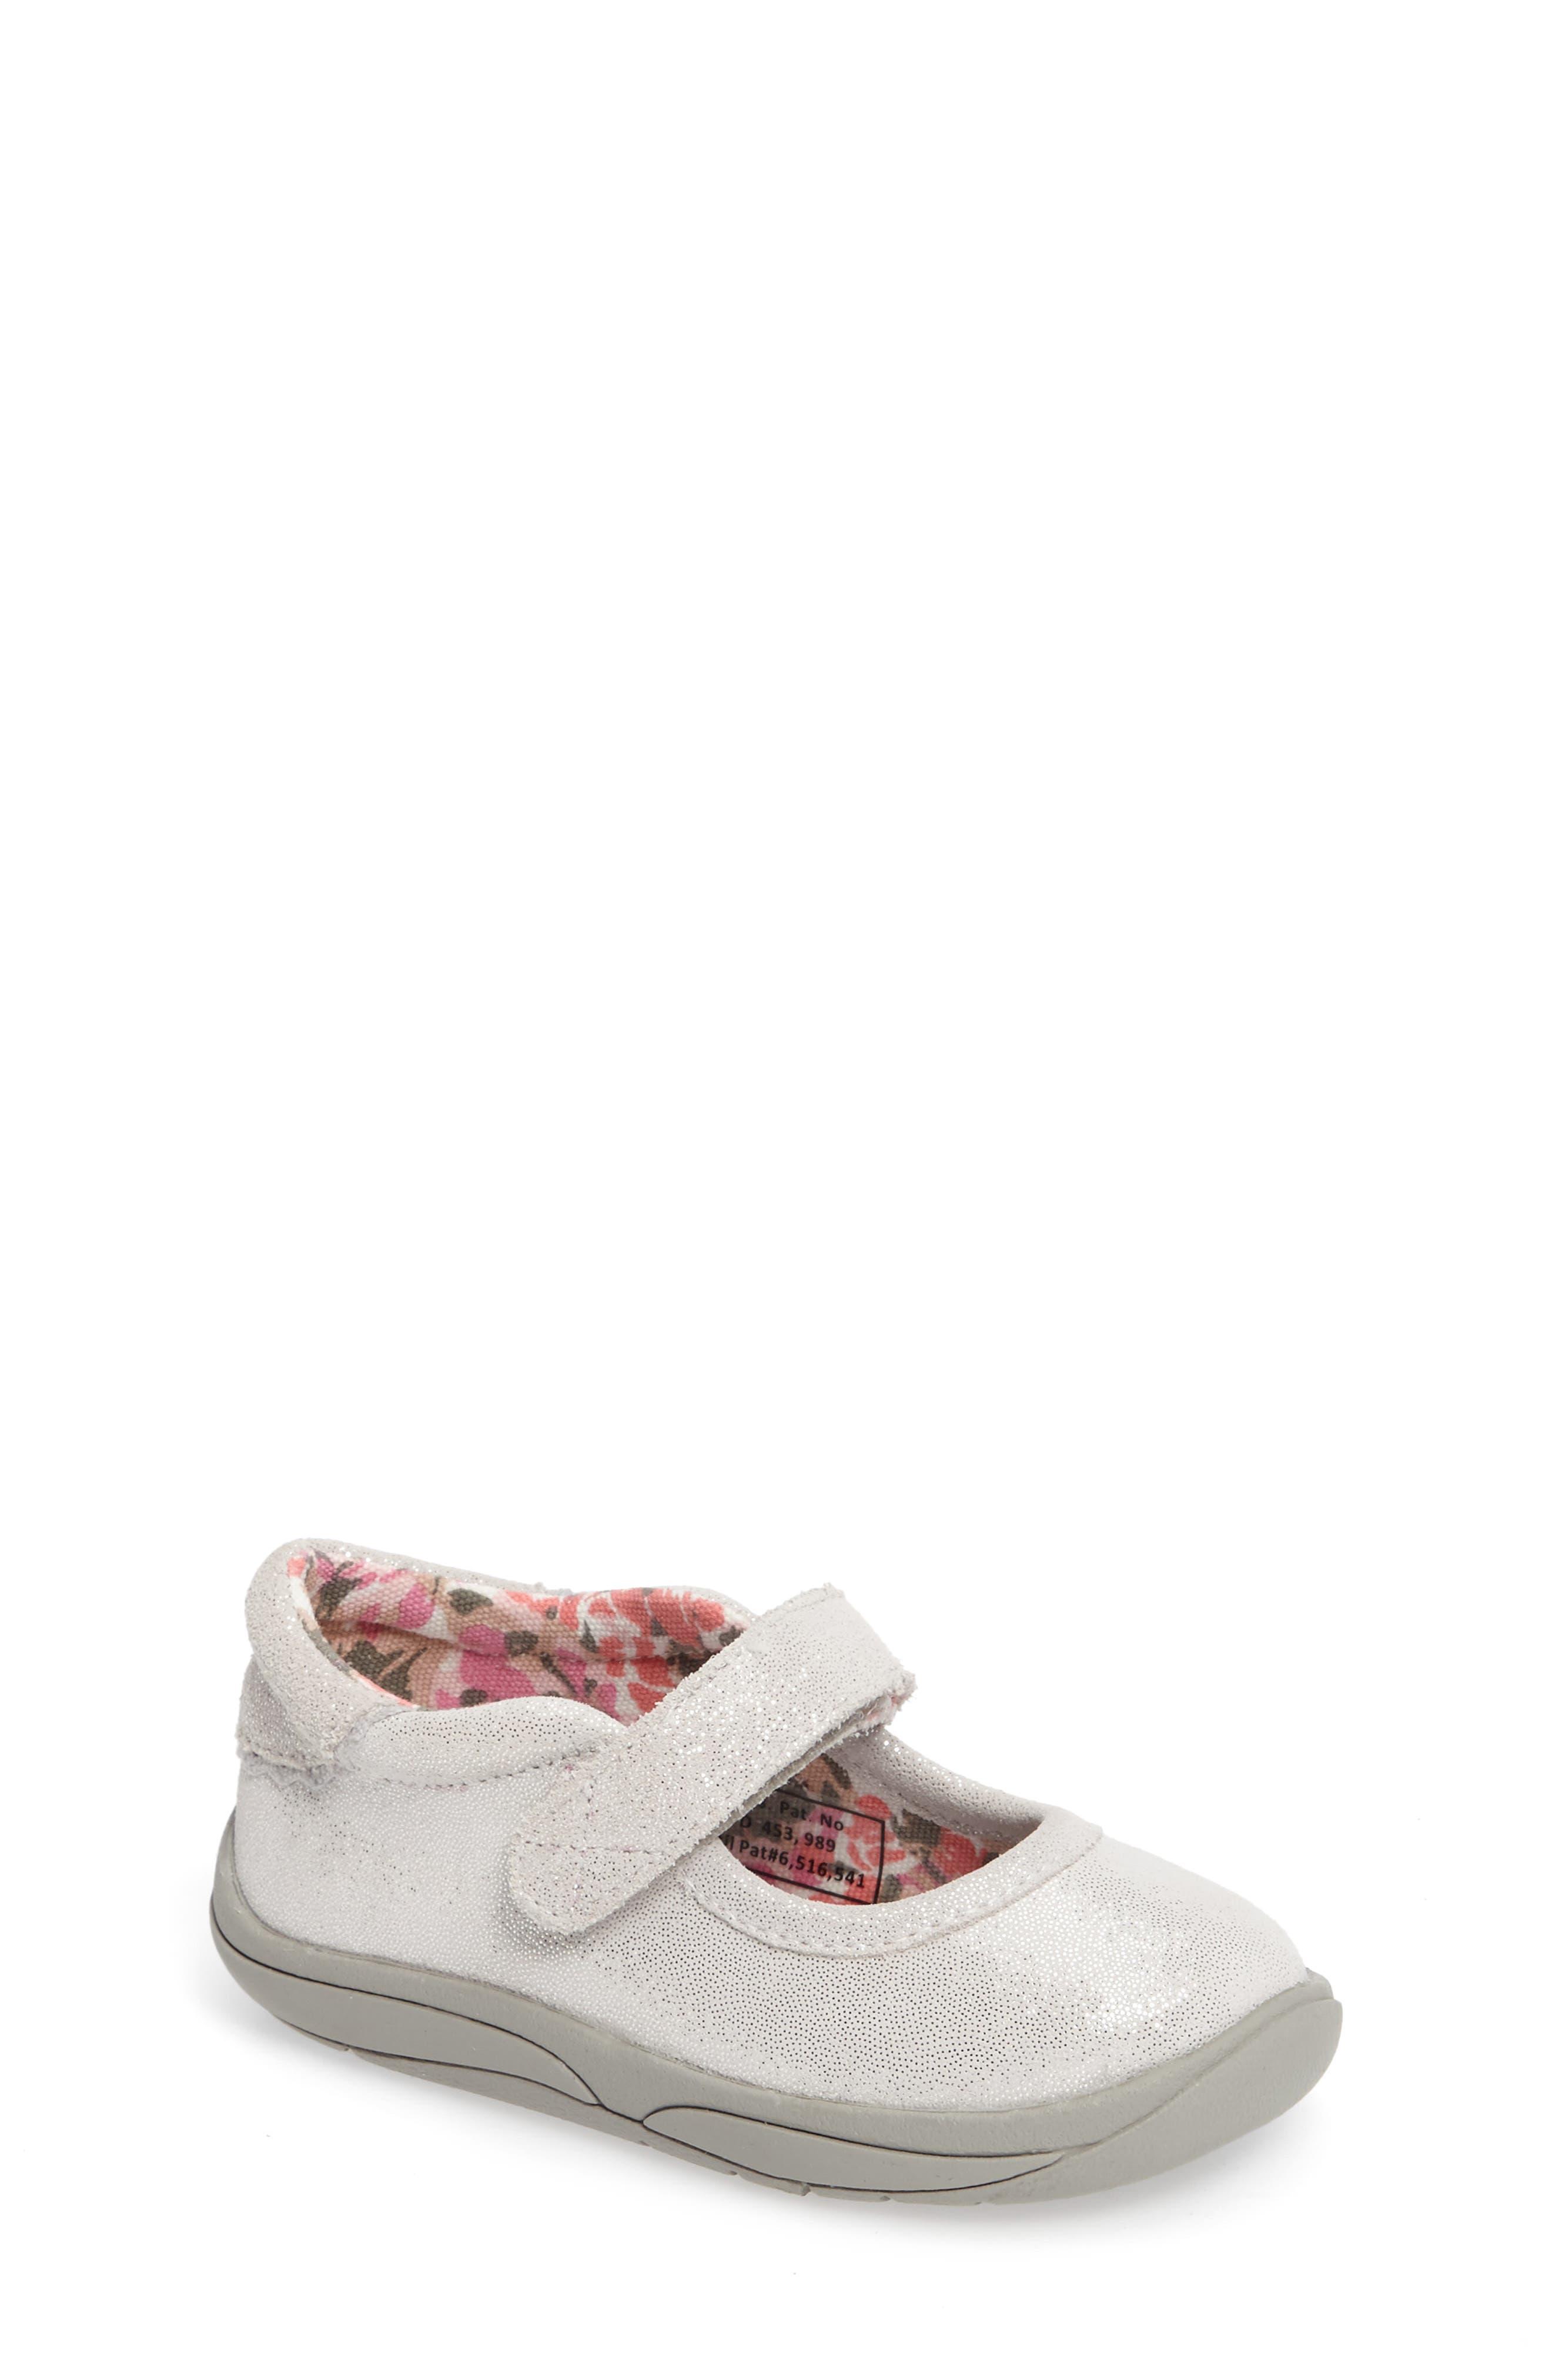 TUCKER + TATE Ella Shimmery Mary Jane Sneaker